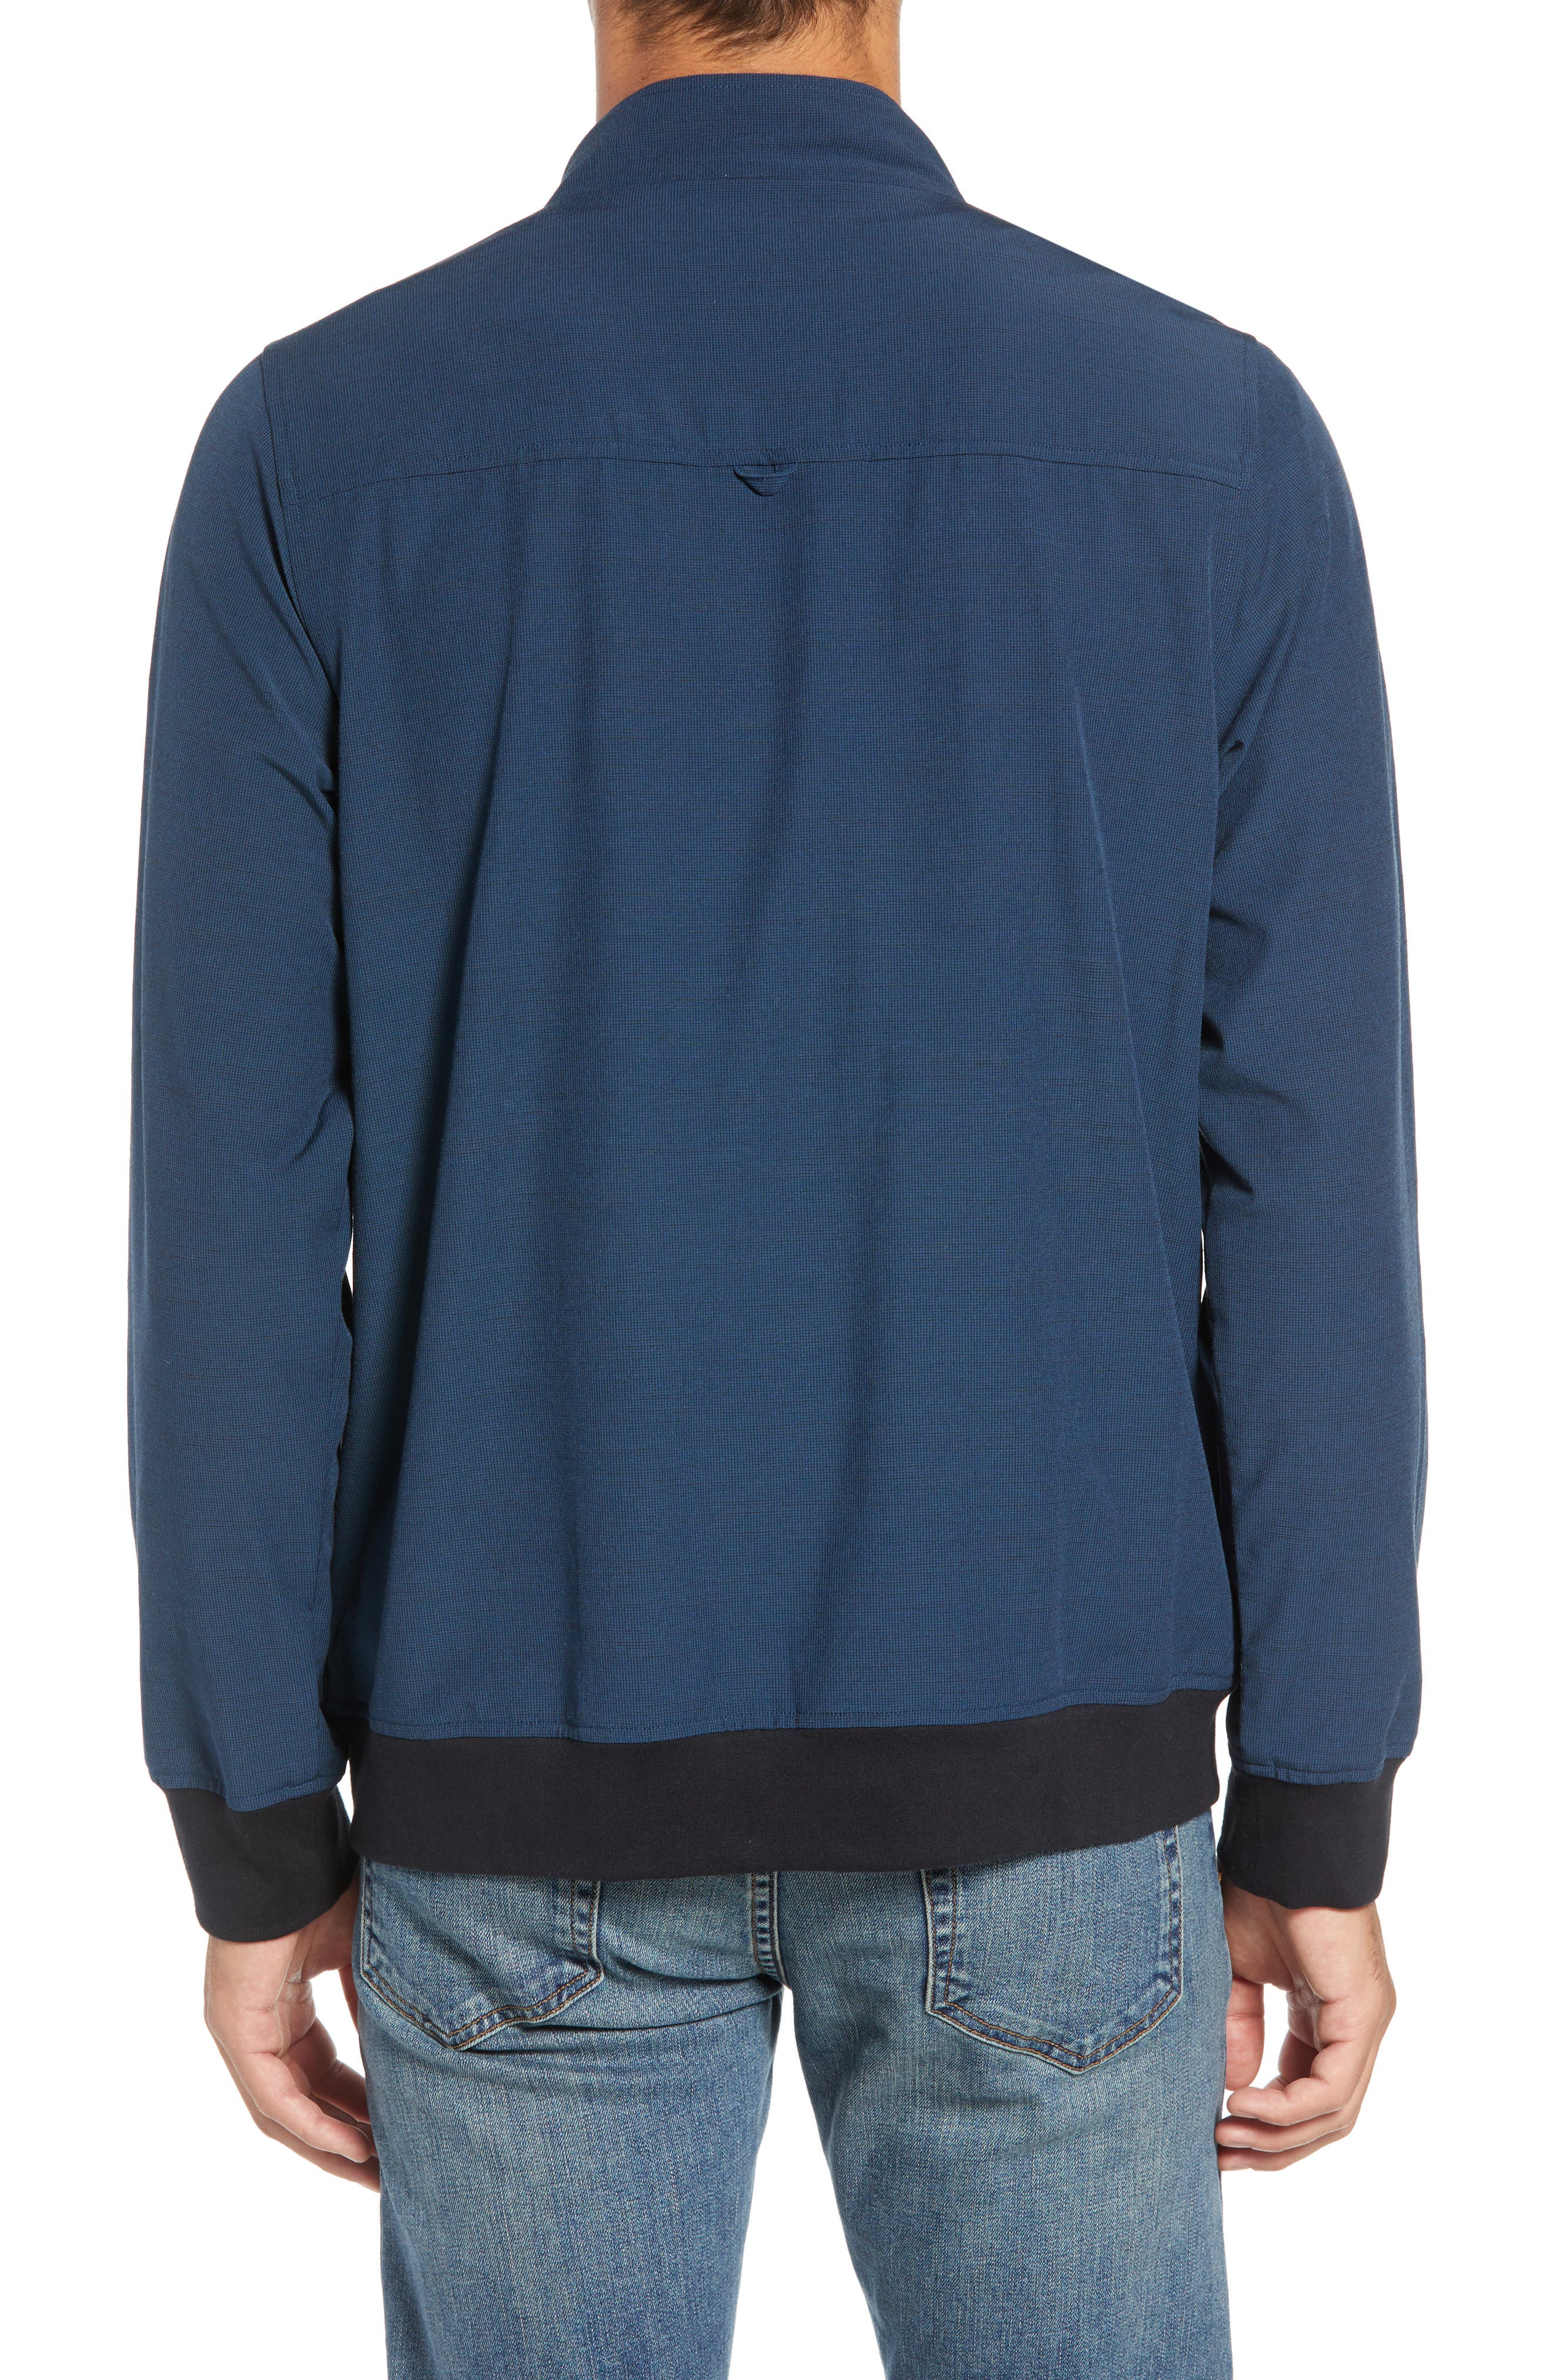 Ridgley Regular Fit Jacket,                             Alternate thumbnail 2, color,                             BLUE WING TEAL/ BLACK